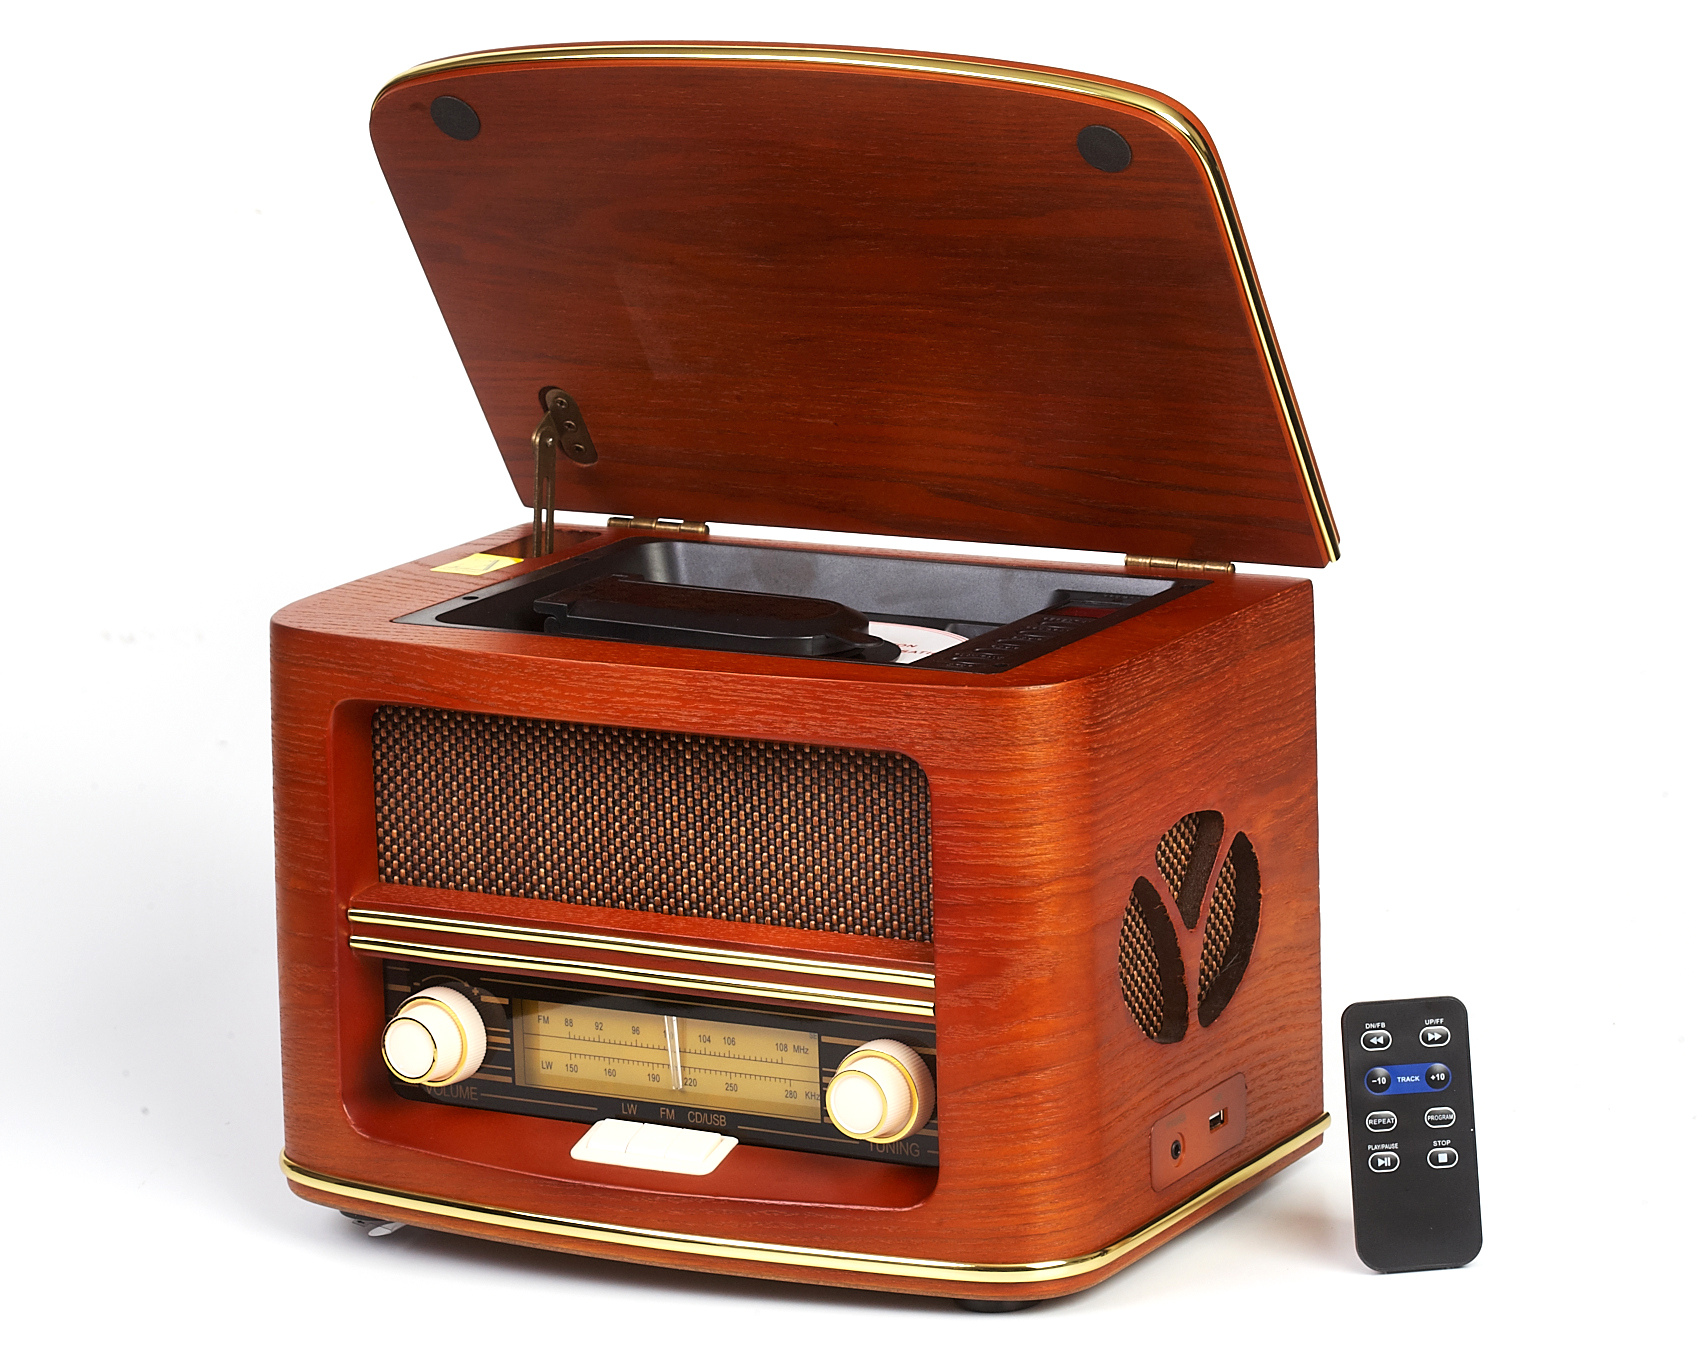 Camry CR 1109 radio, radiopulksteņi